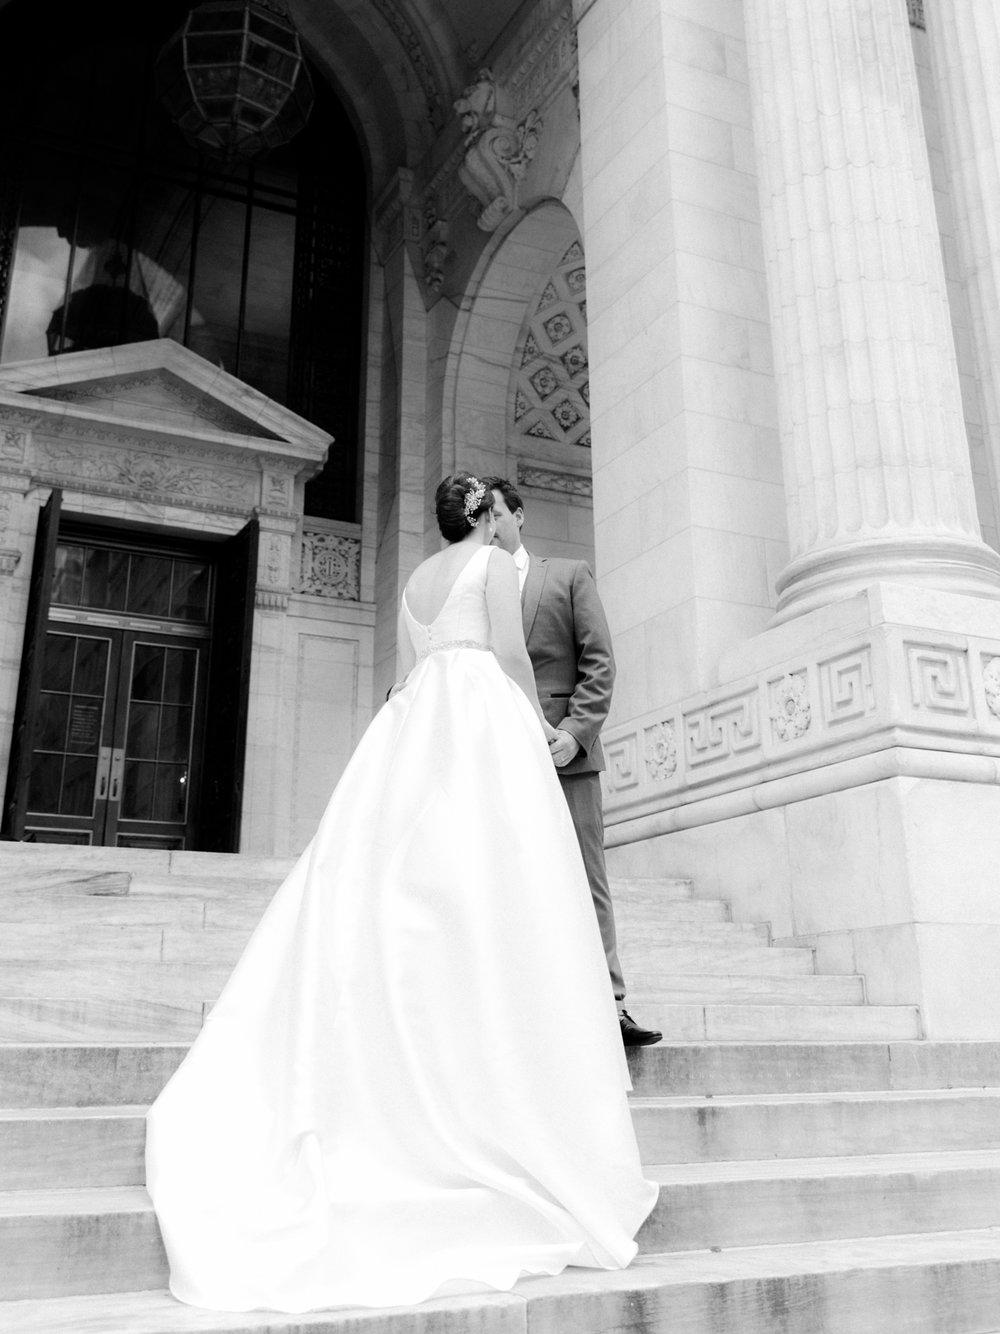 NYC-wedding-photography-by-Tanya-Isaeva-cover-6.jpg